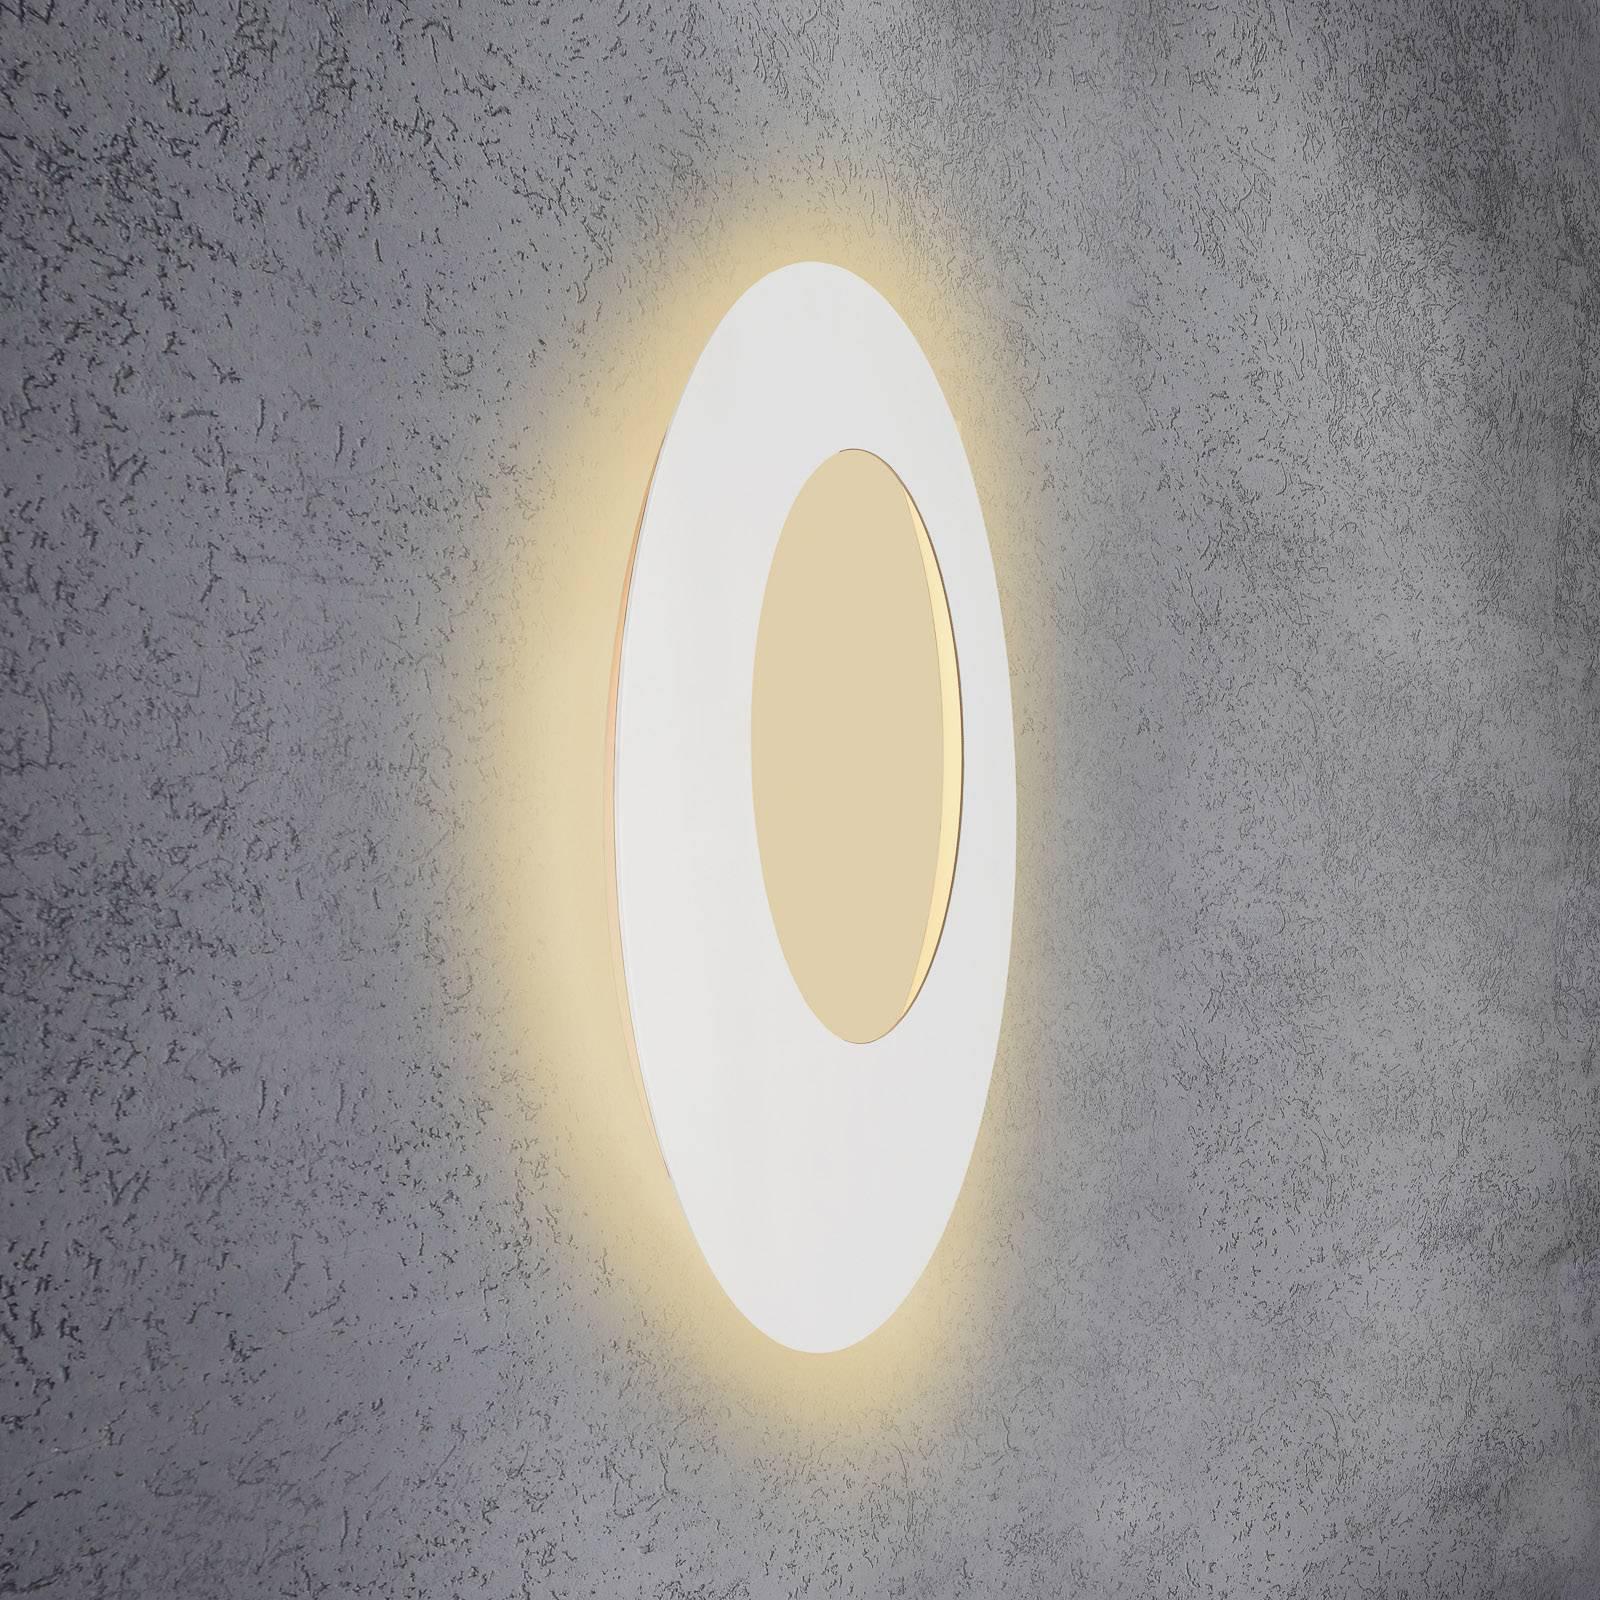 Escale Blade Open LED-vegglampe, hvit, Ø 79 cm